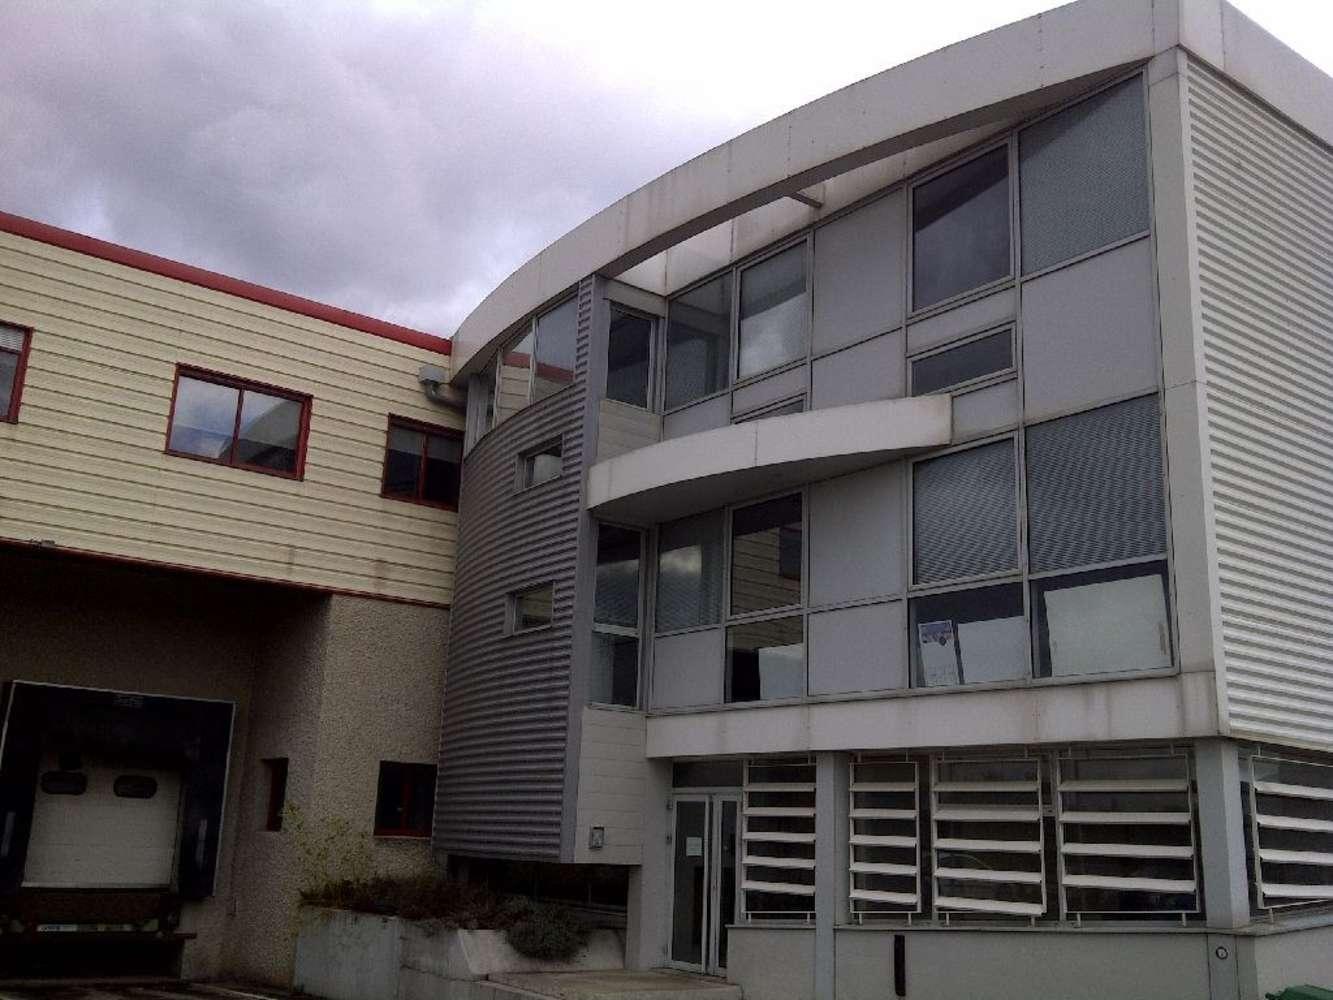 Activités/entrepôt Corbas, 69960 - Location entrepot Corbas (Lyon Est) - 10029403